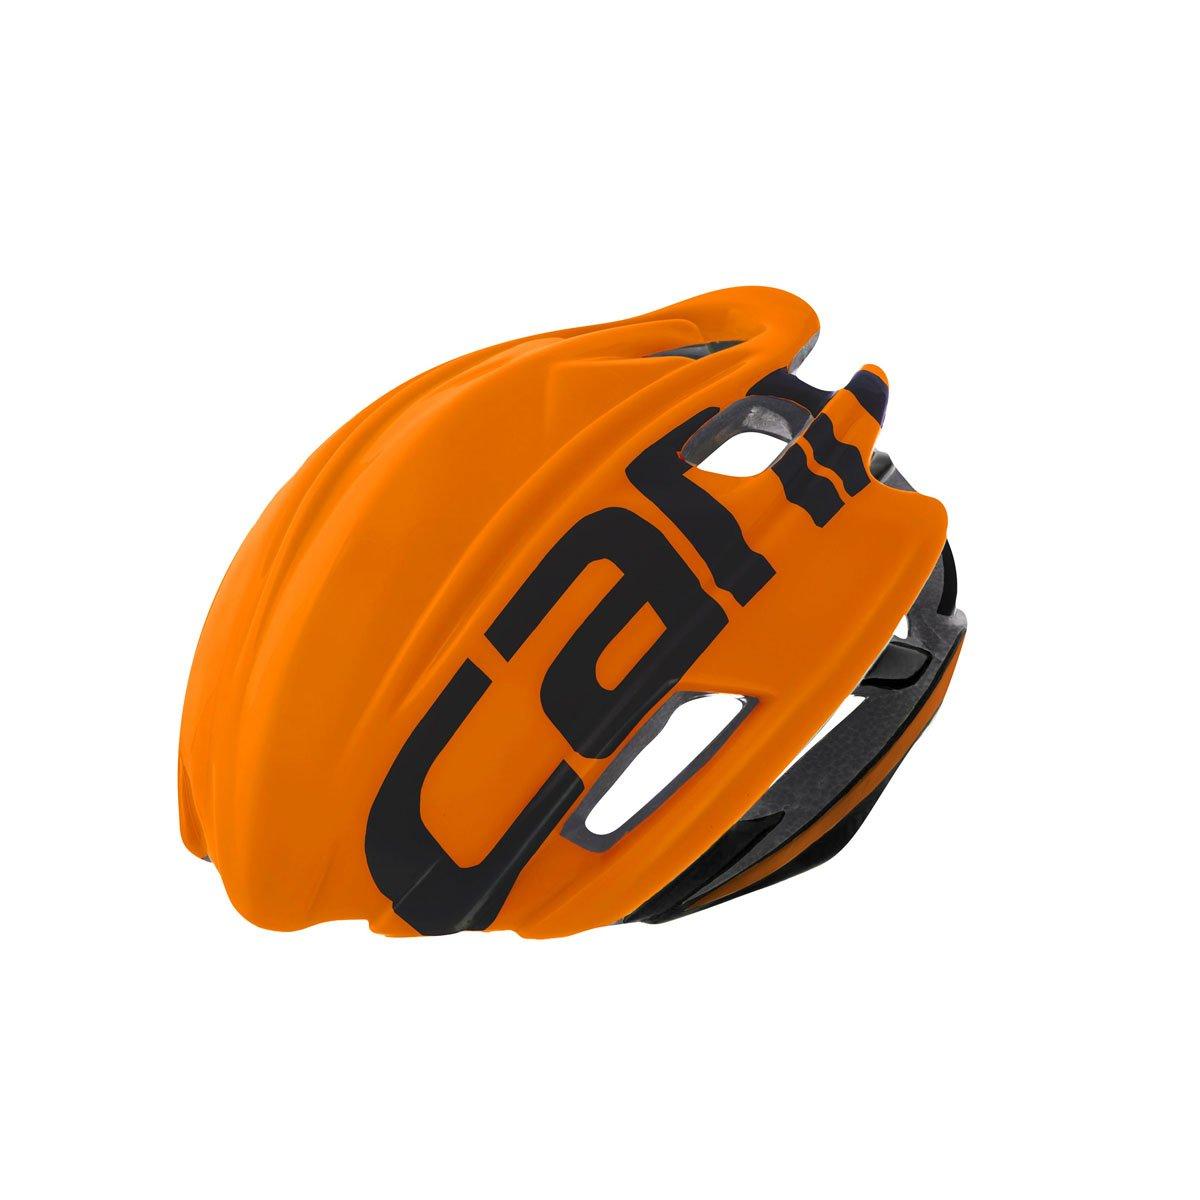 Cannondale Cypher Aero Rennrad Fahrrad Helm Orange 2017